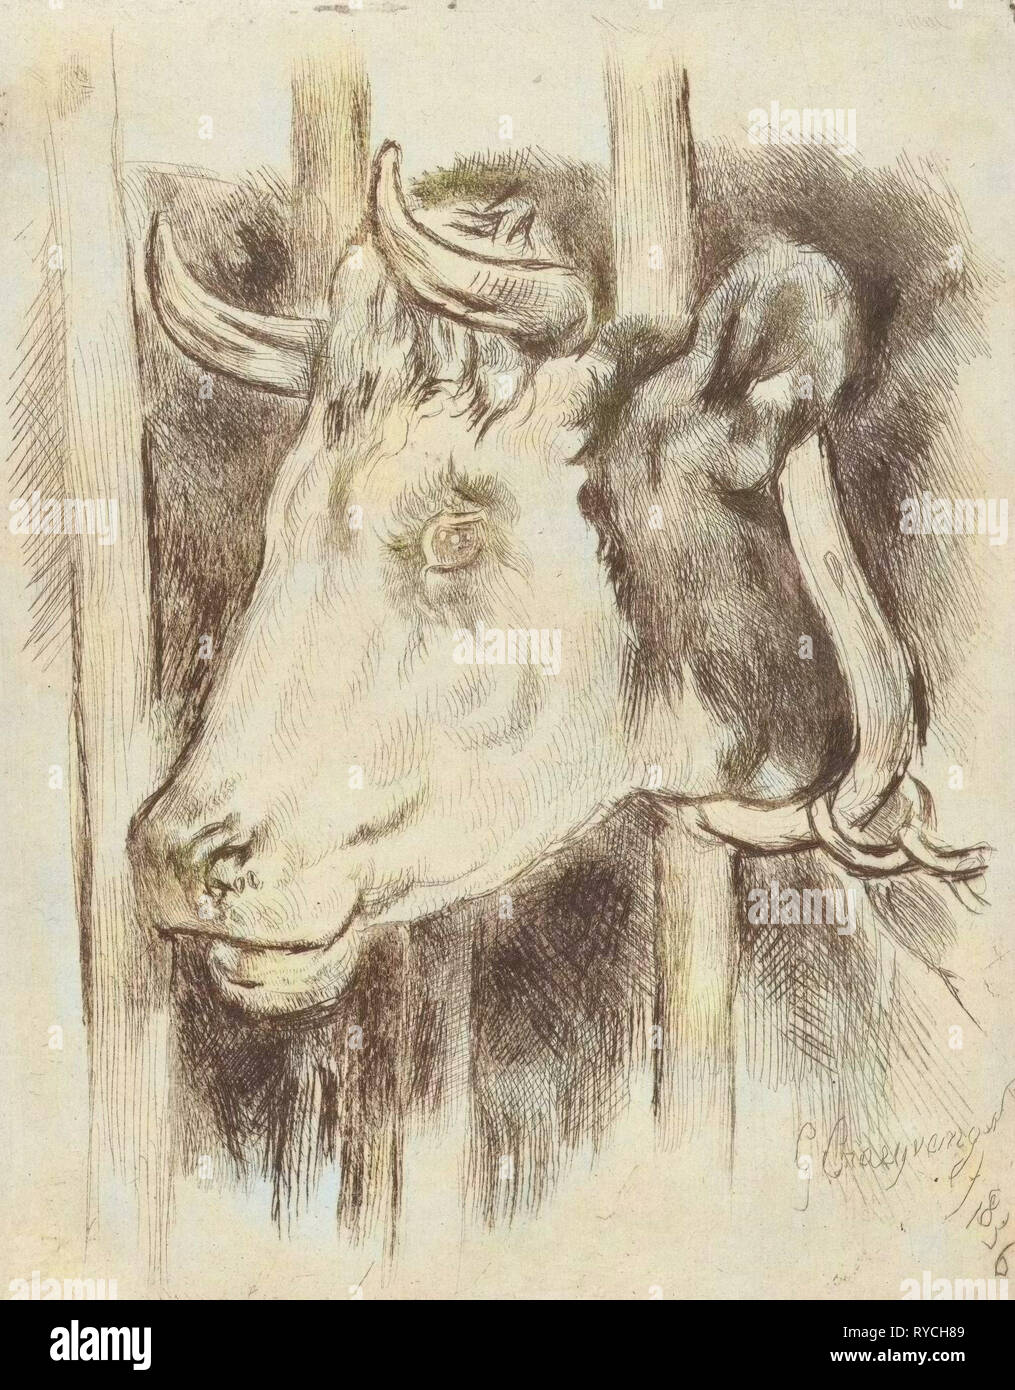 Head of a cow, print maker: Gijsbertus Craeyvanger, 1836 Stock Photo